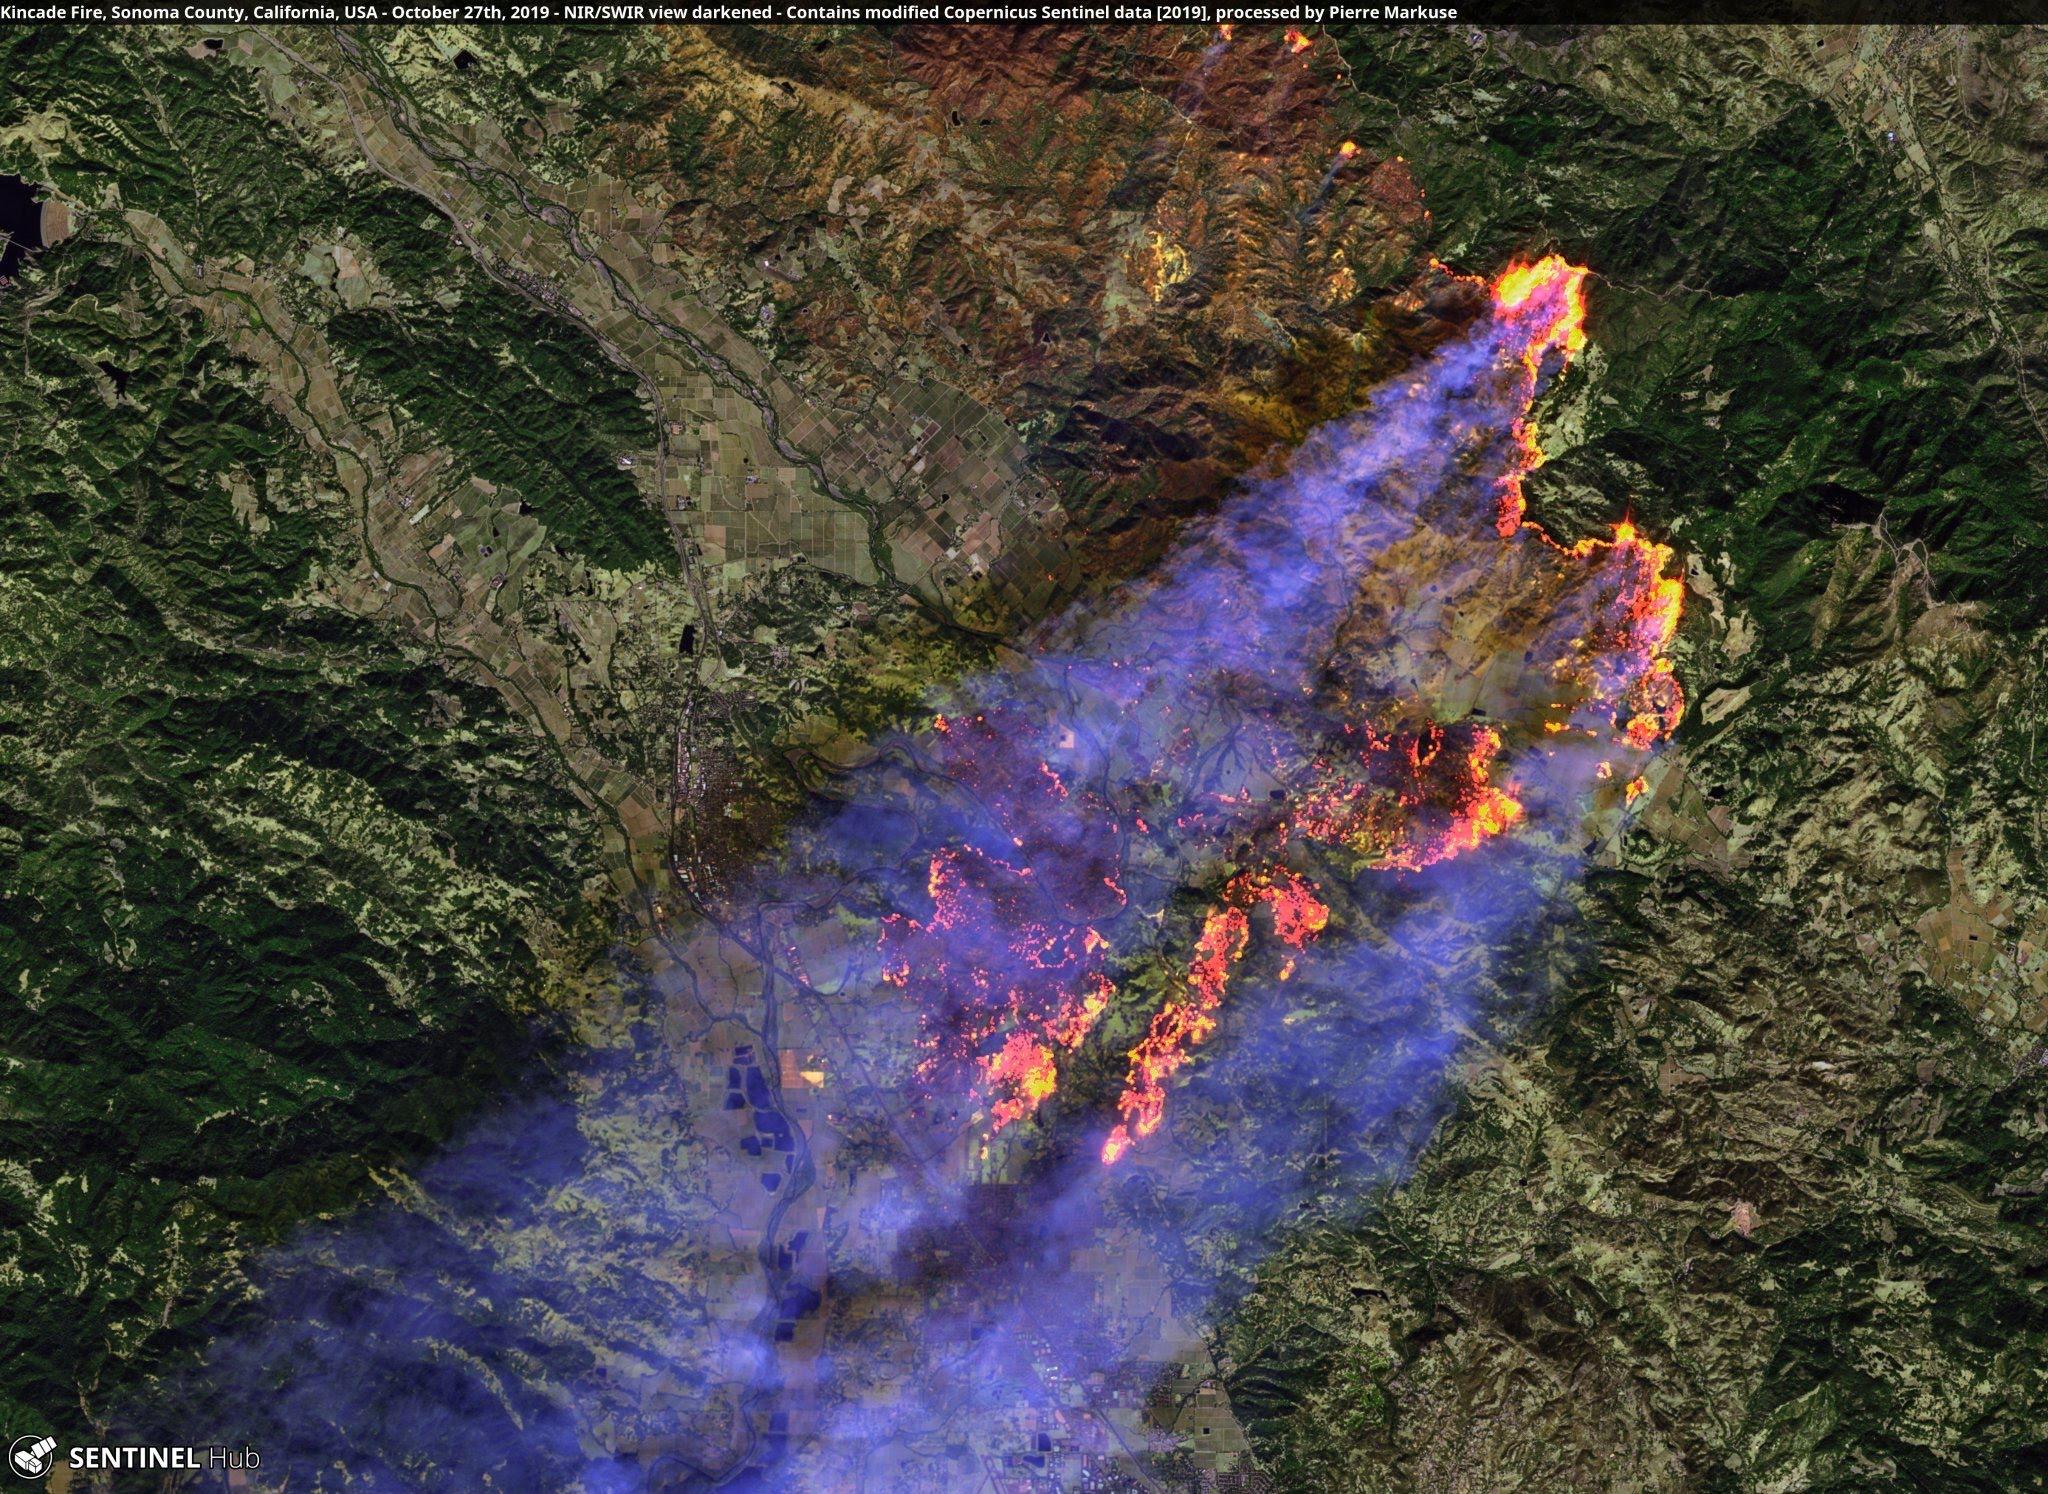 Kincade Fire Satellite Image